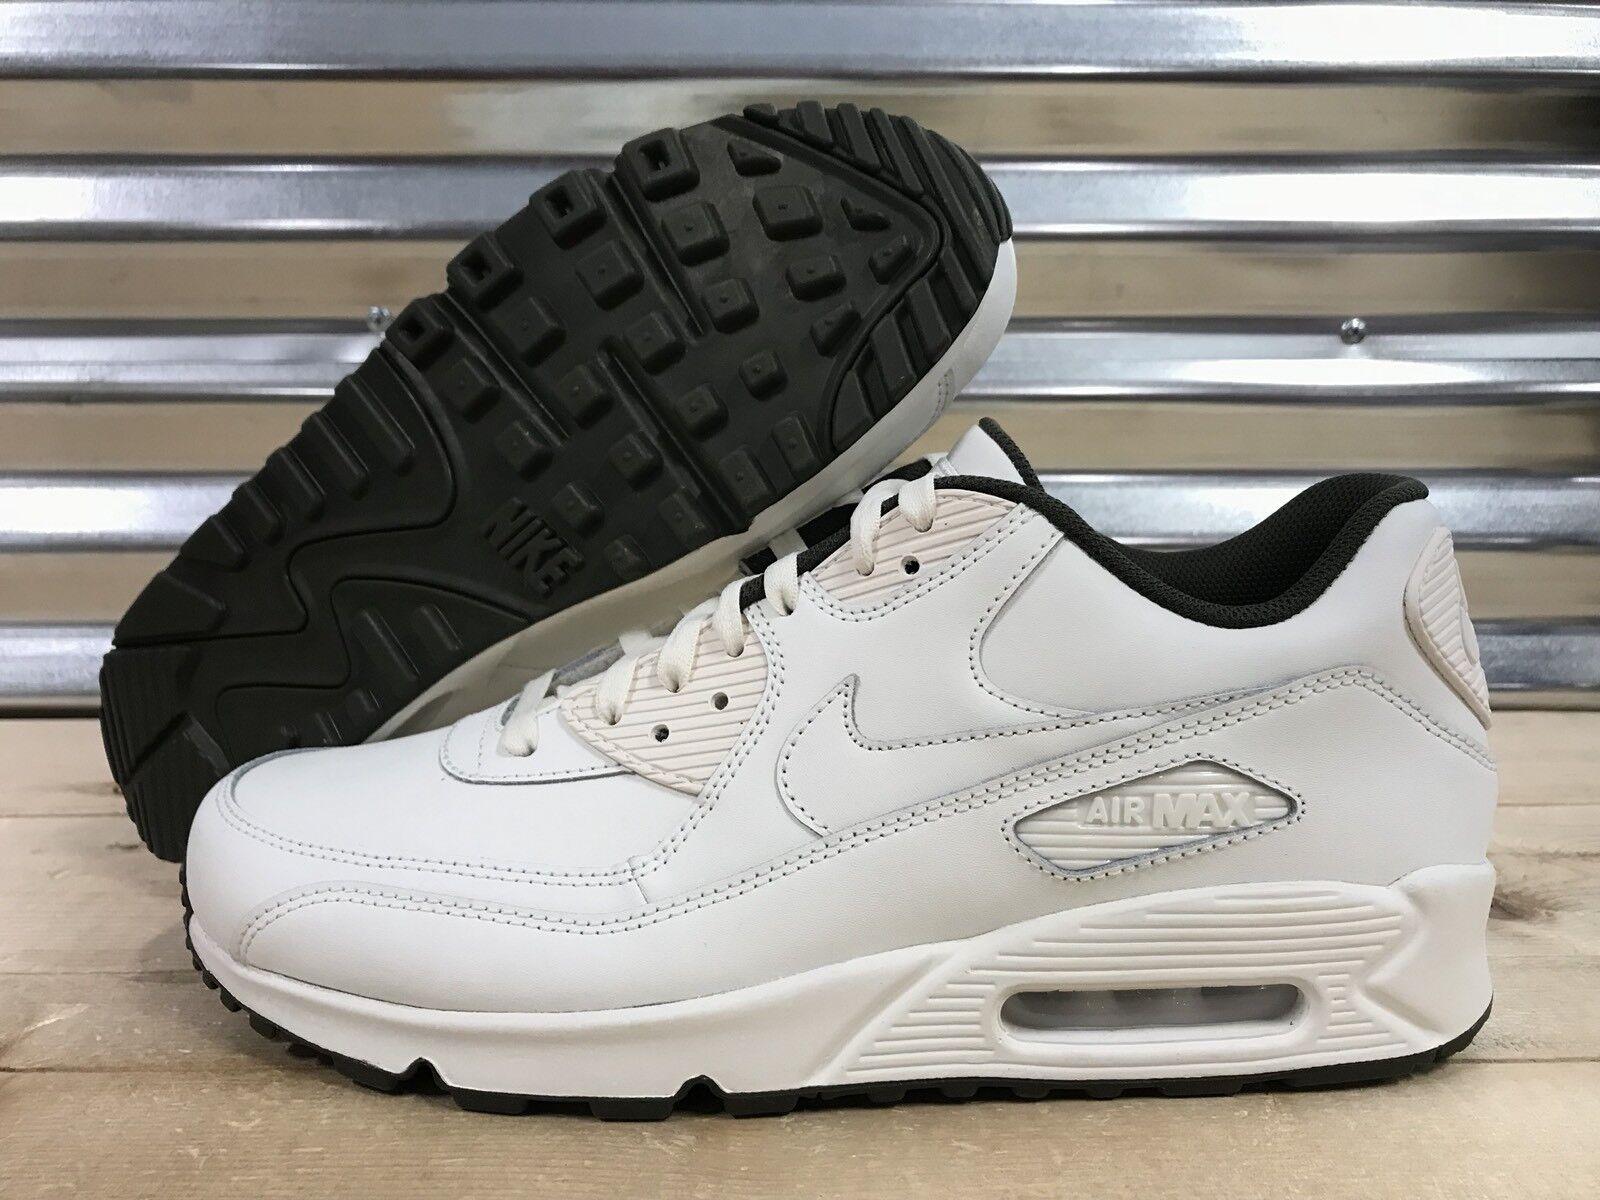 Nike Air Max 90 iD chaussures Summit blanc vert Cargo Khaki vert blanc SZ 11.5 ( 931902-994 ) 170de9